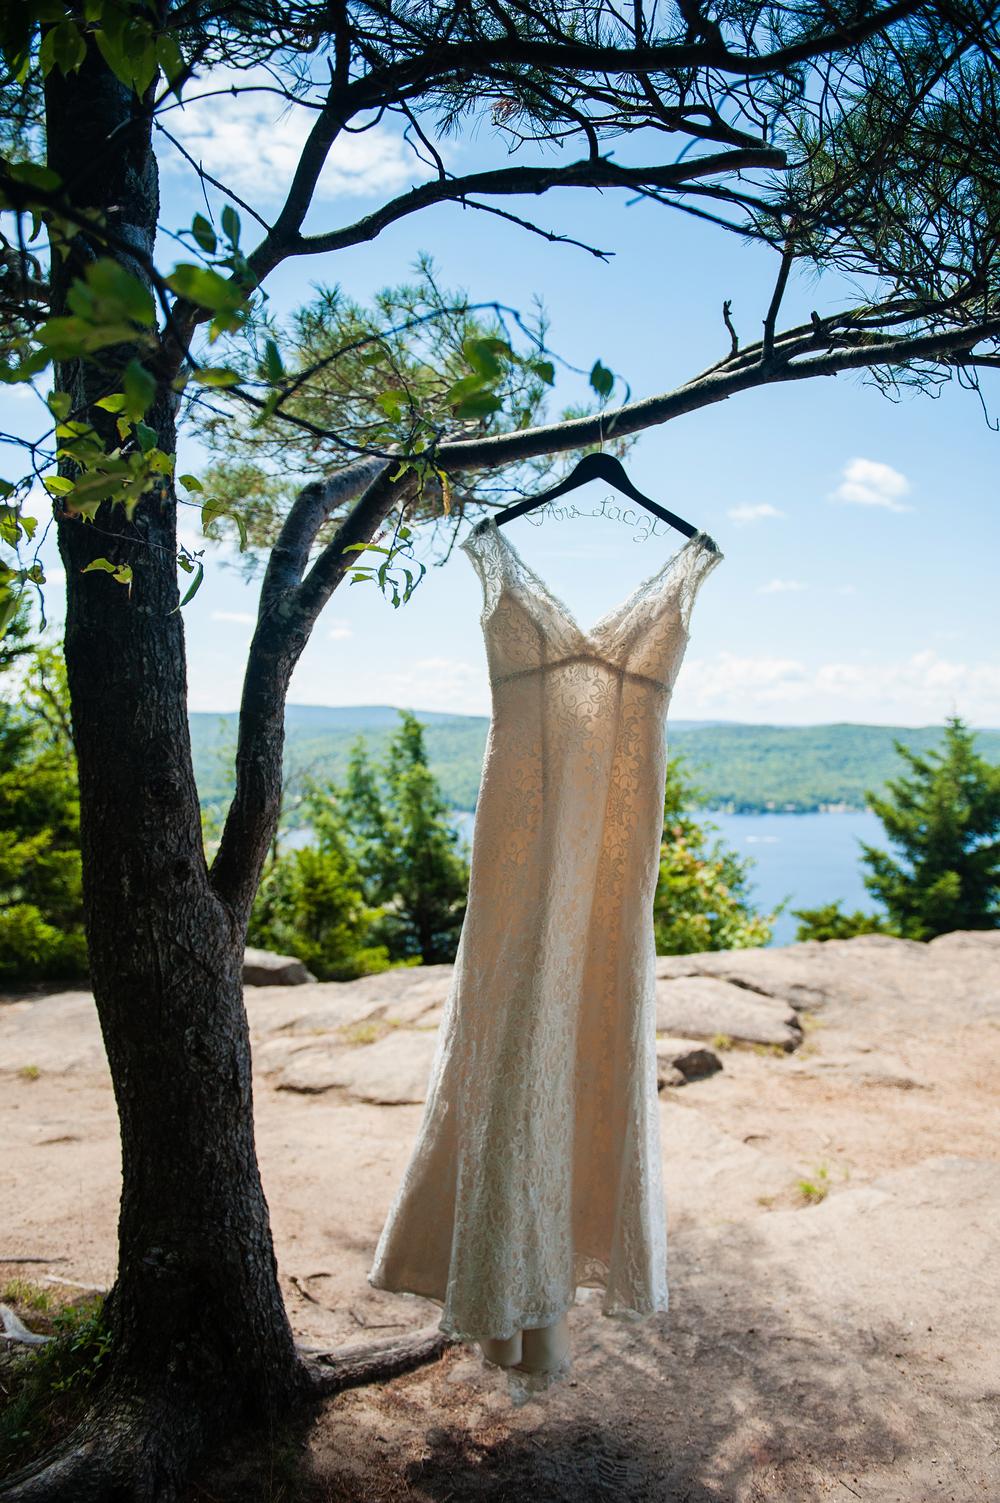 Bride's Dress in Tree Adirondack Wedding